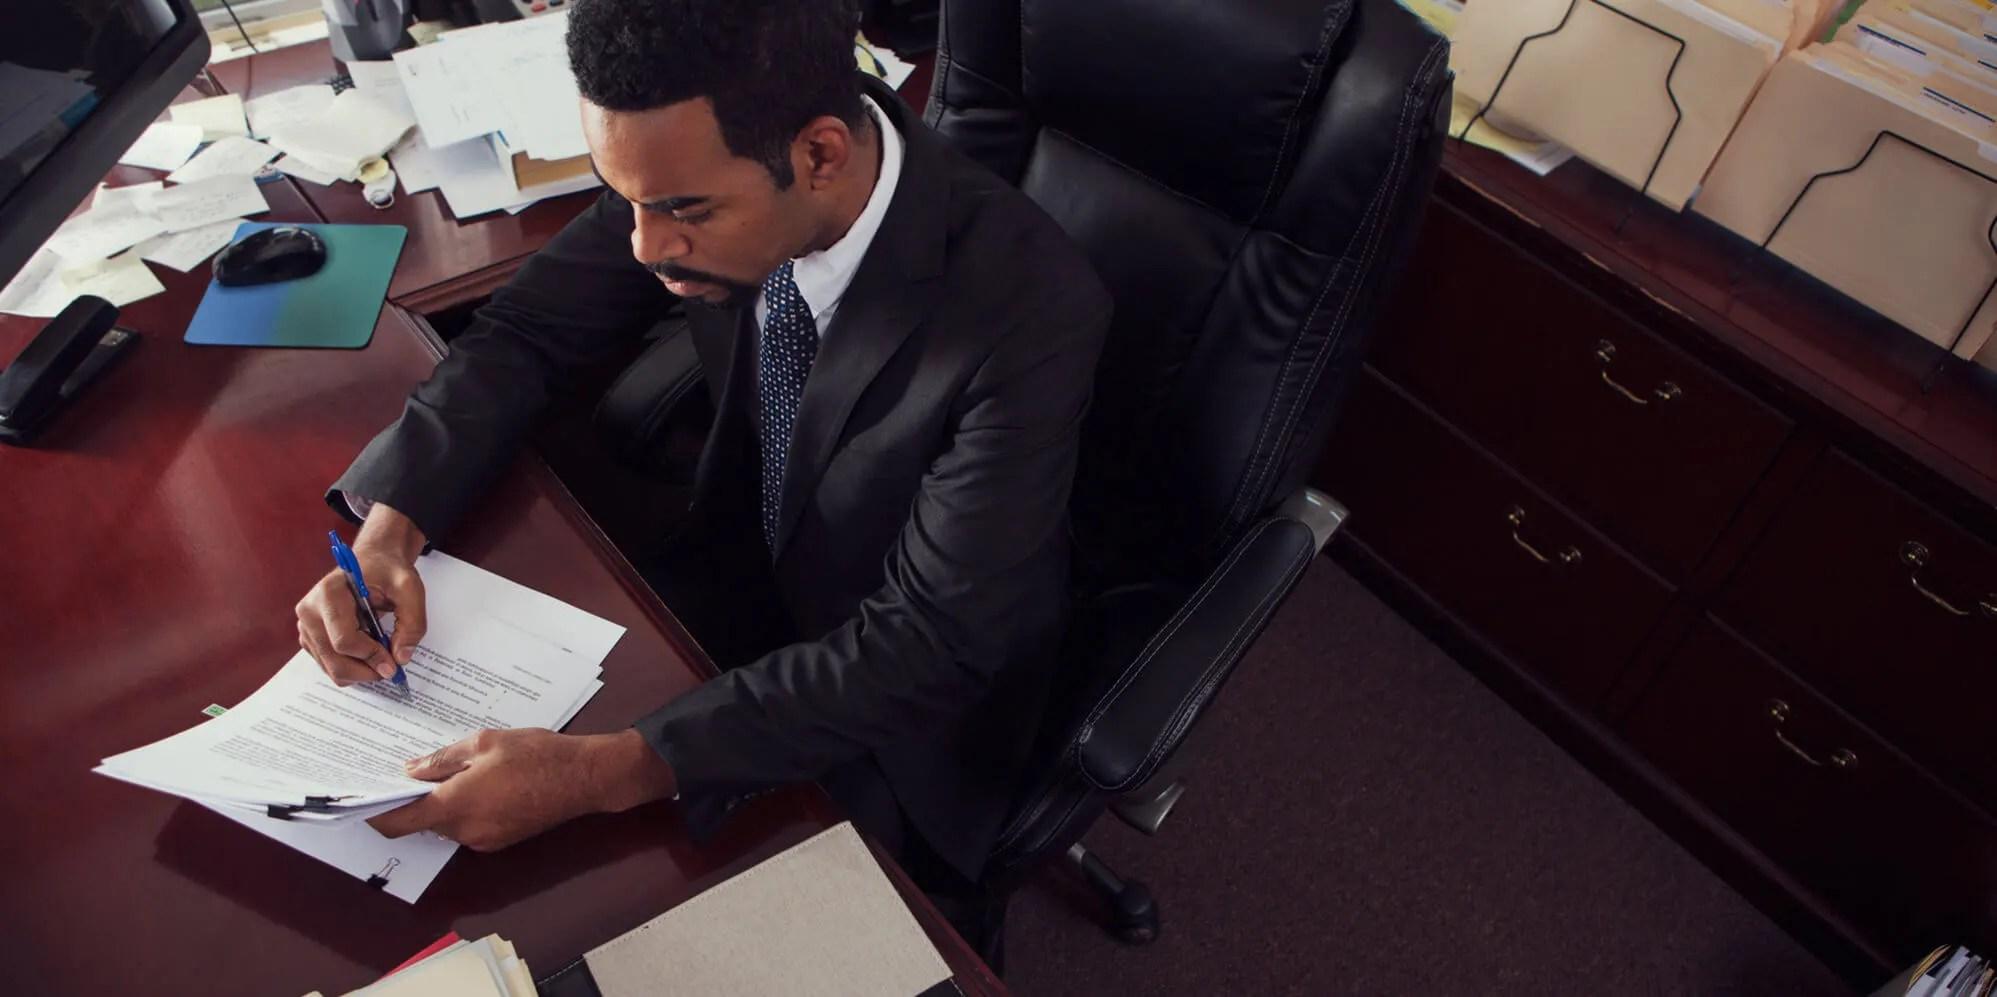 Criminal Defense Attorney Cover Letter - Cover Letter Resume ...